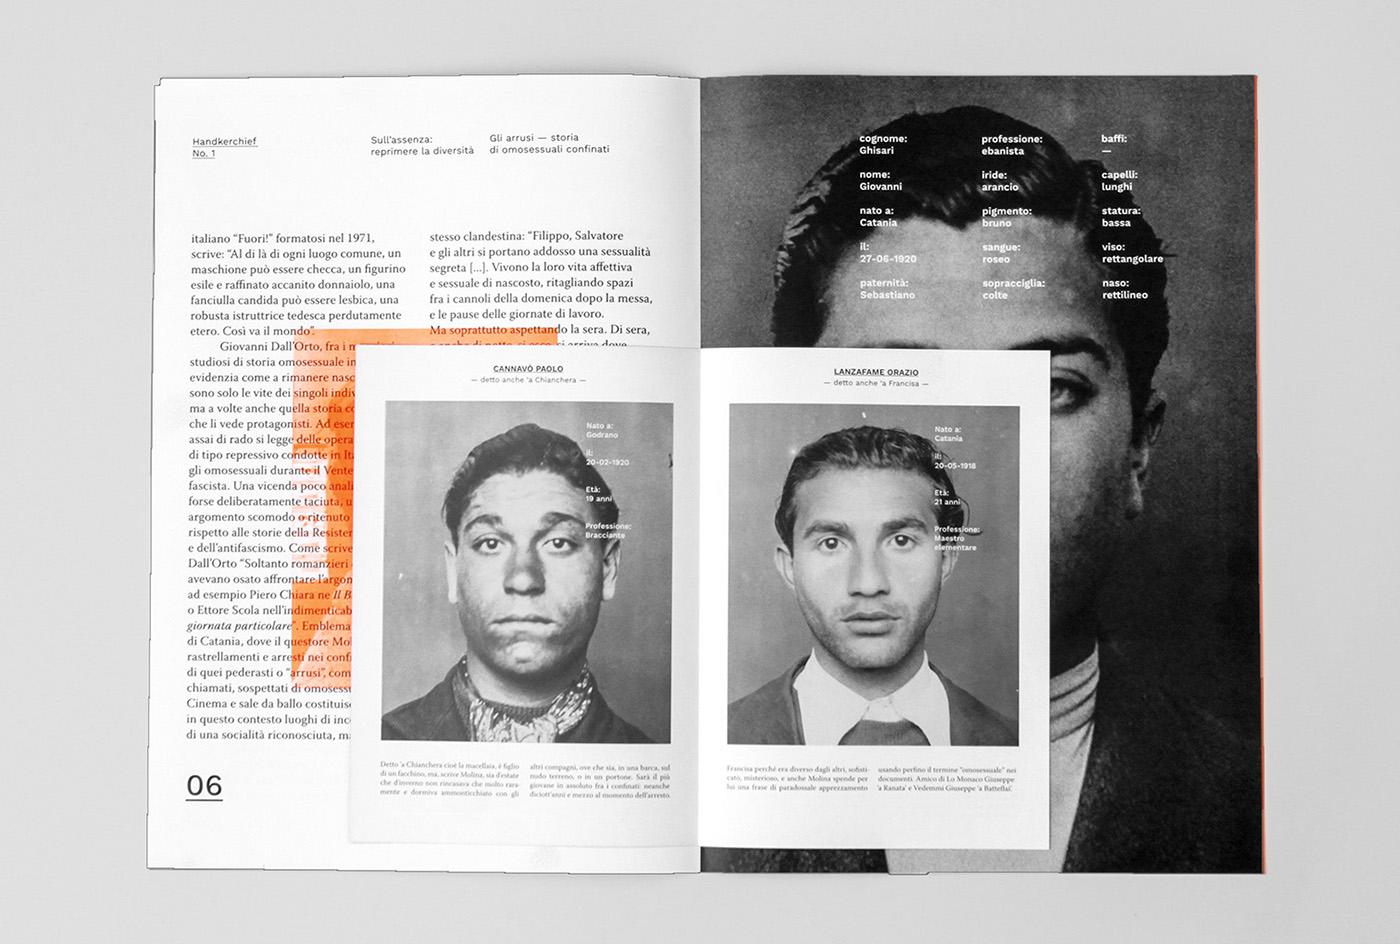 Handkerchief magazine Magazine design LGBT homophobia transphobia social